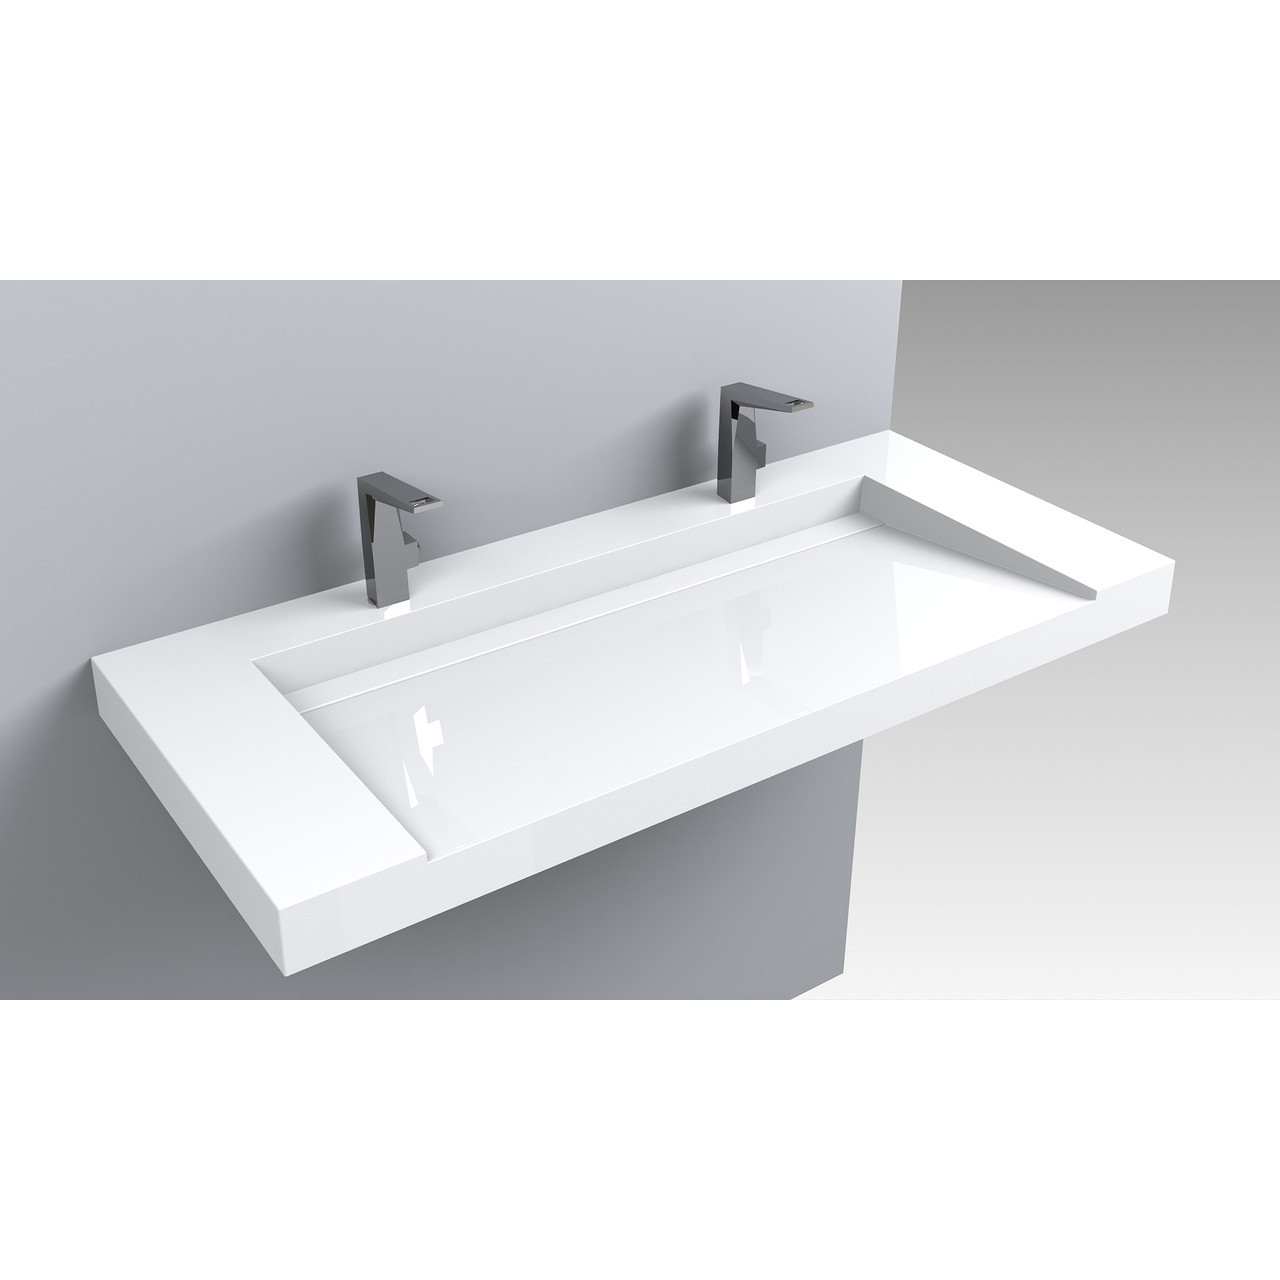 Раковина для ванной подвесная Miraggio Olmos 1200 (глянец/ 1201*529*140 мм)